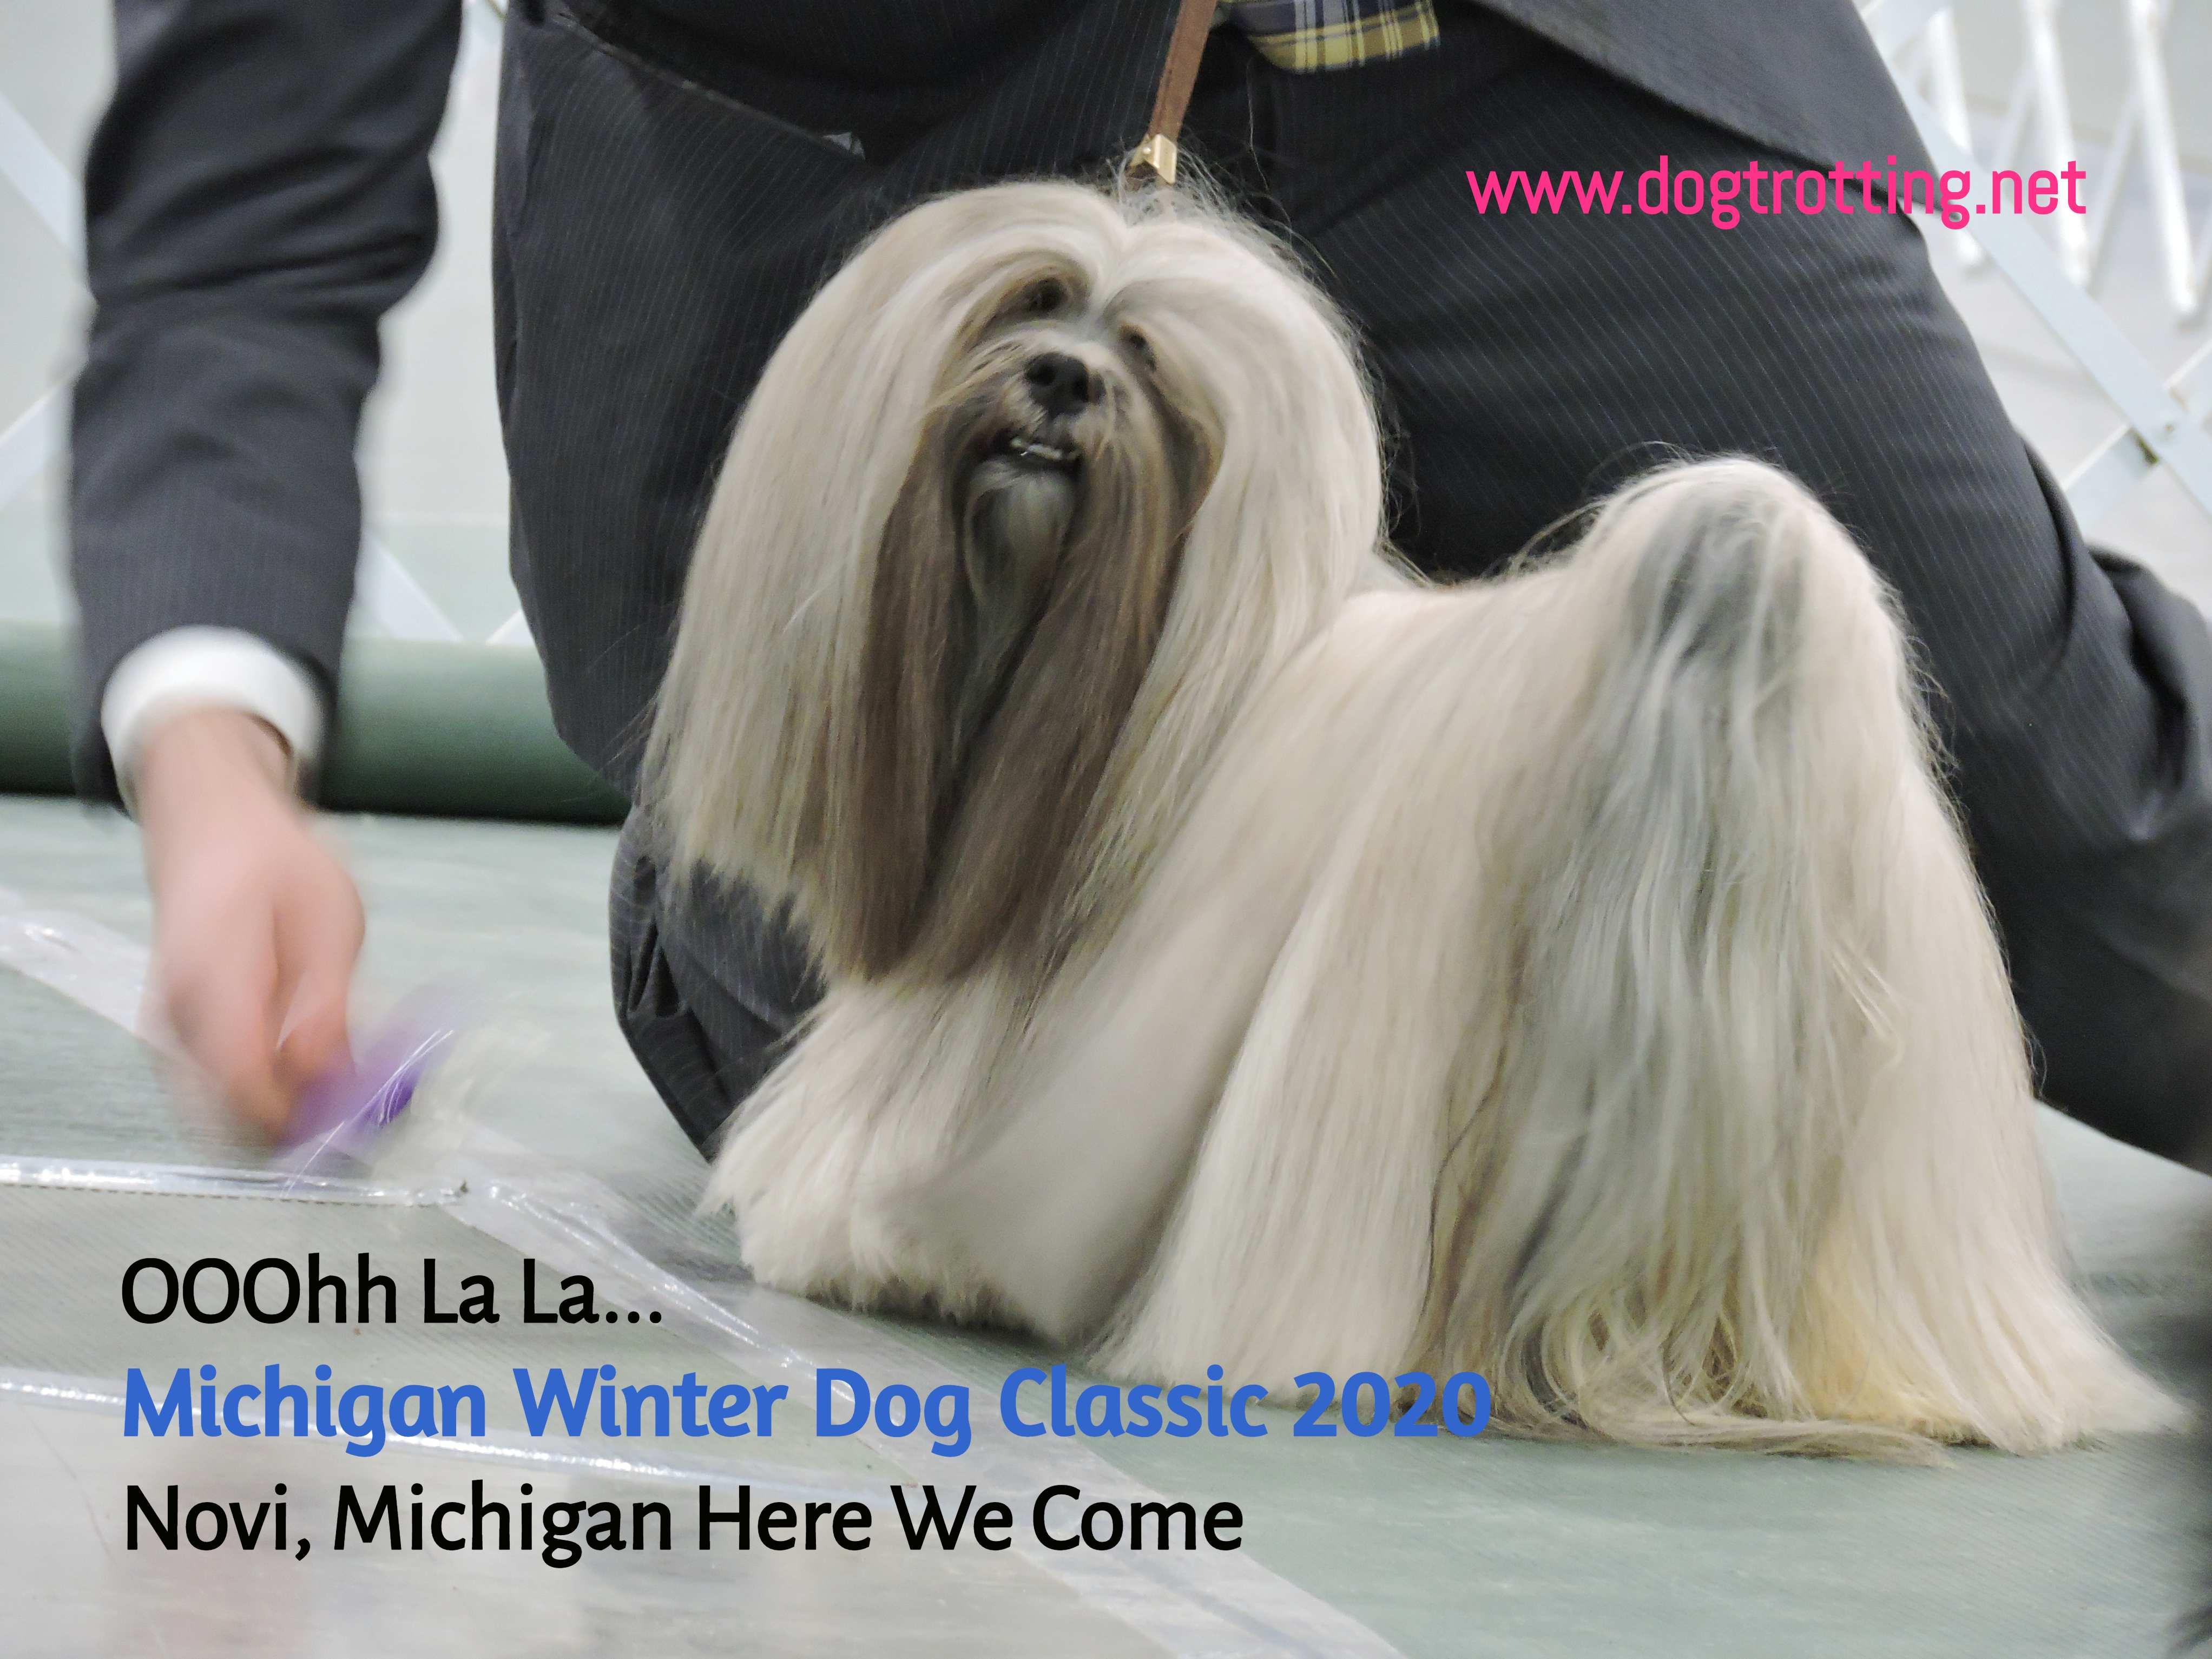 Travel Novi, MI: My Mutt goes to The Michigan Winter Dog Classic 2020